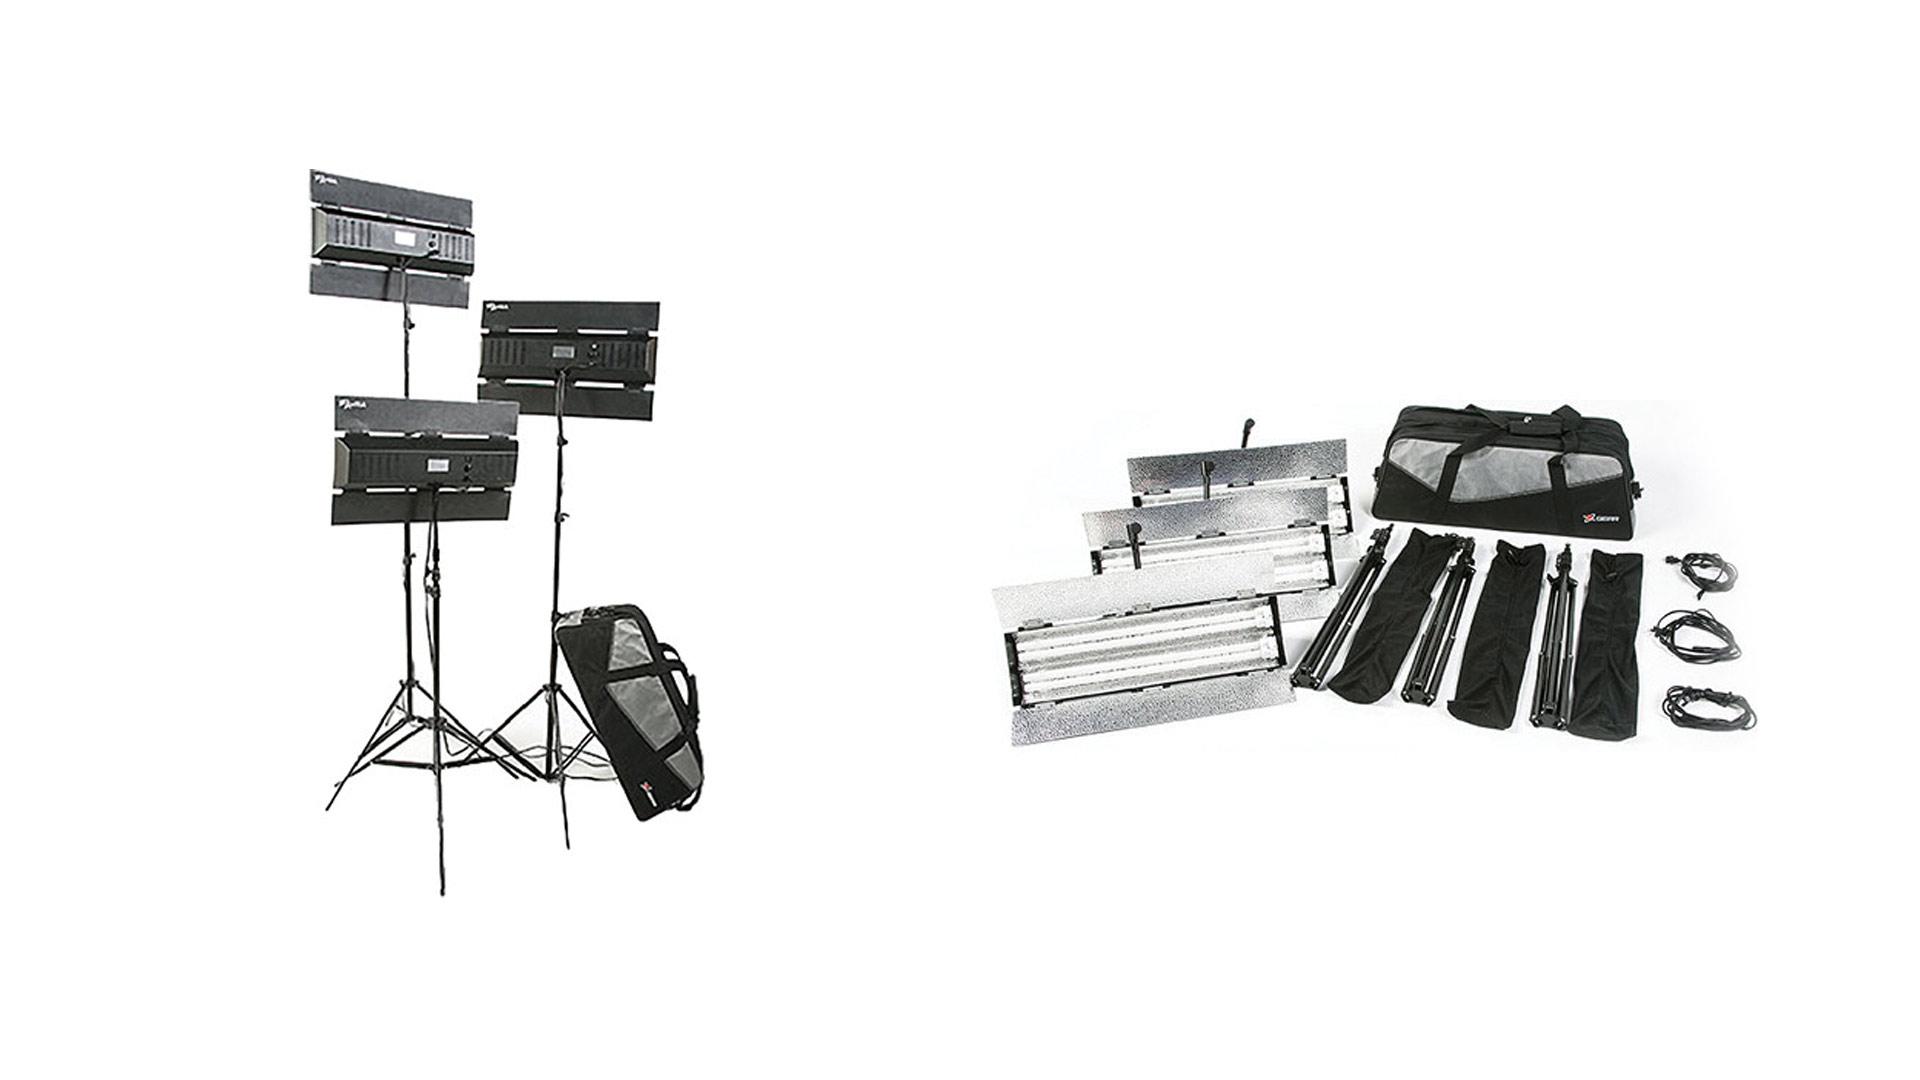 bh photo flash sale - three-point lighting kit